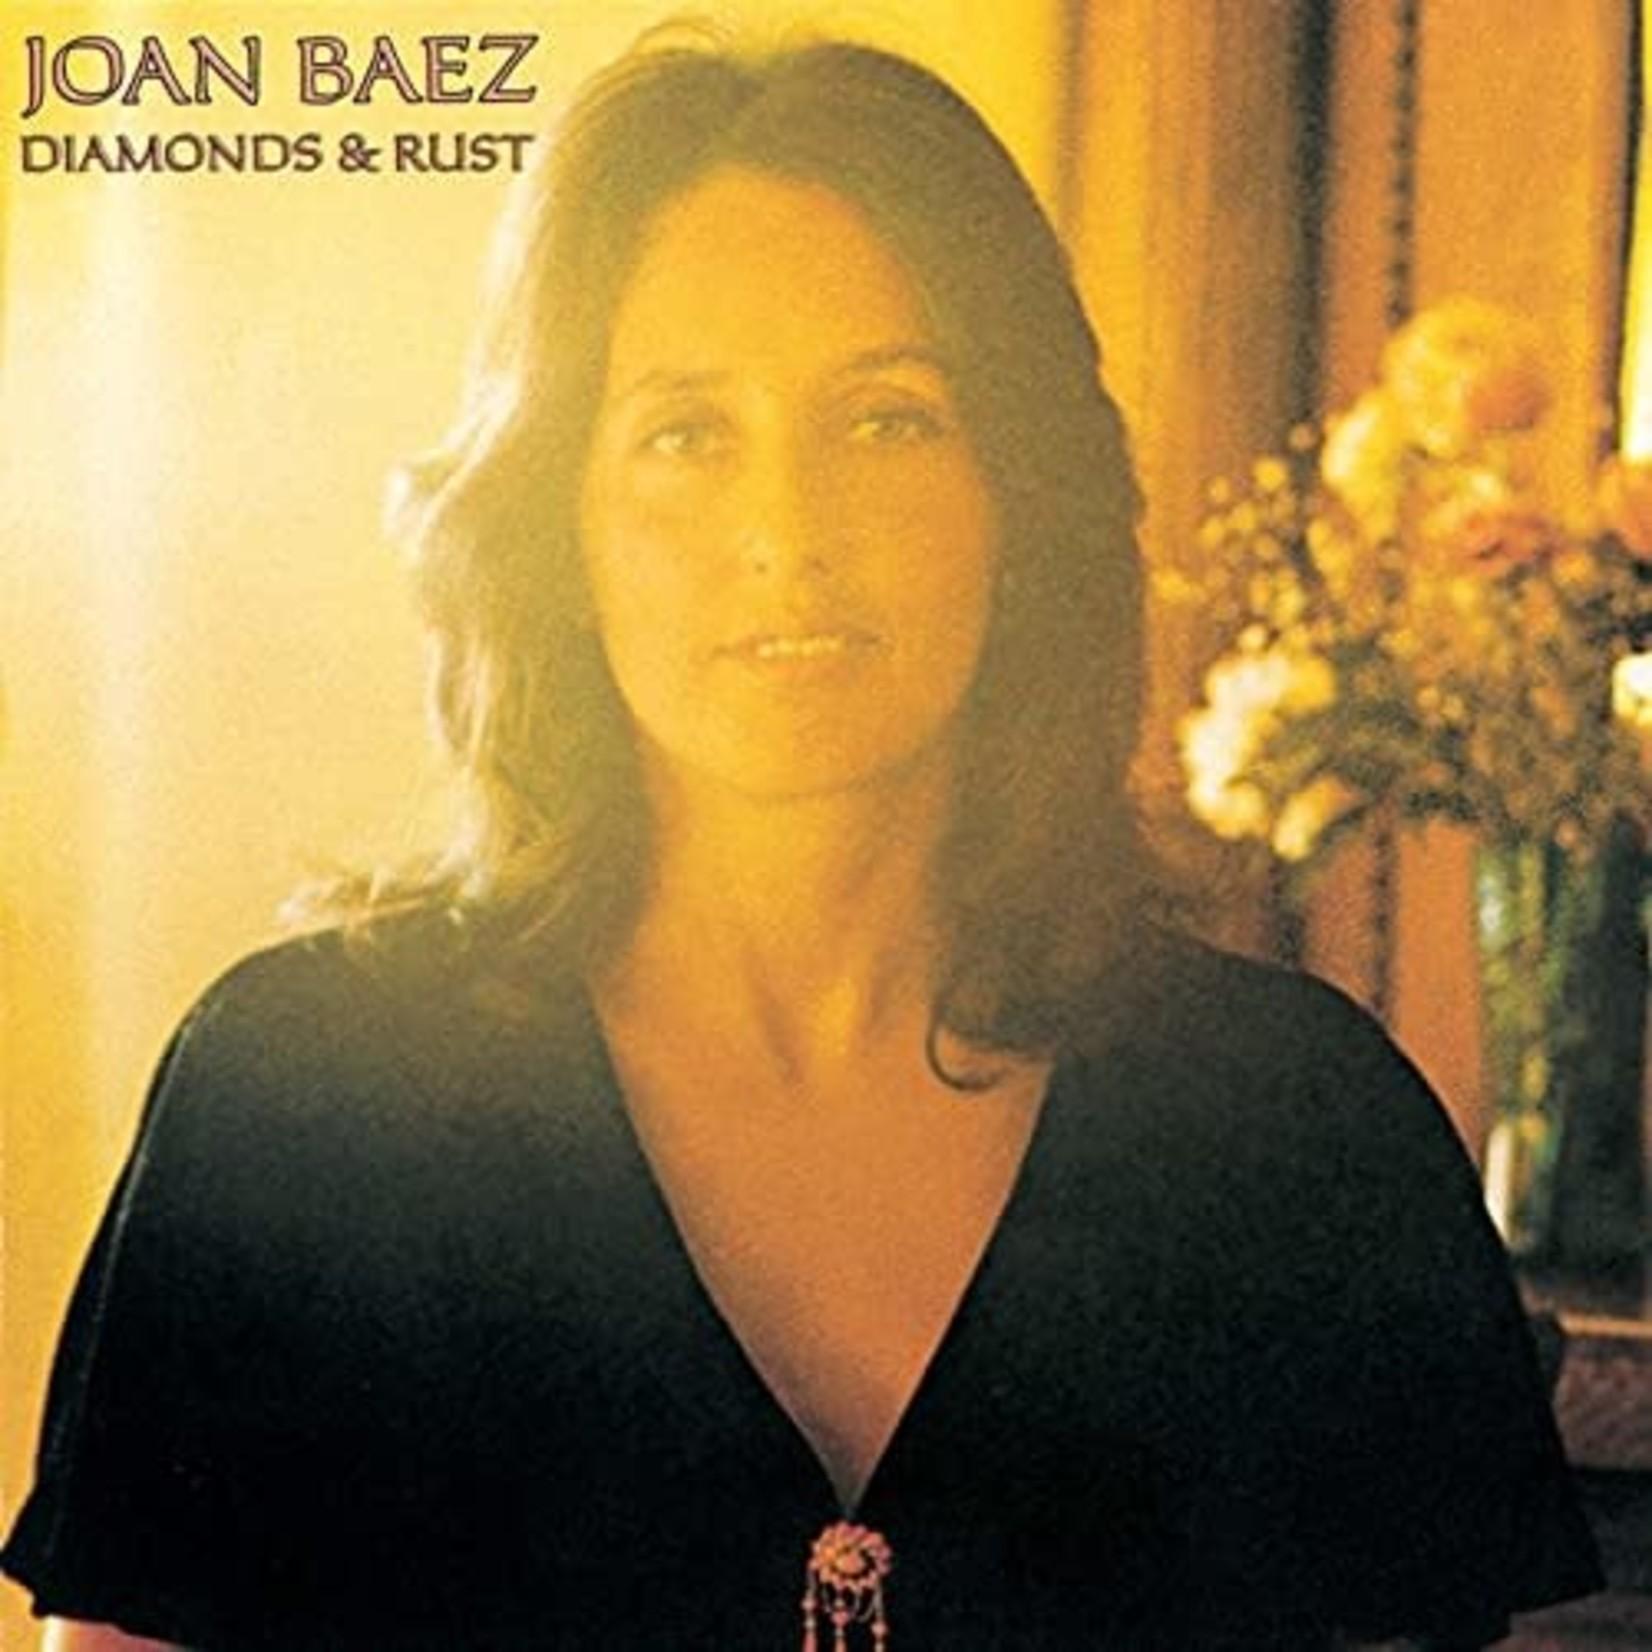 [Vintage] Baez, Joan: Diamonds & Rust